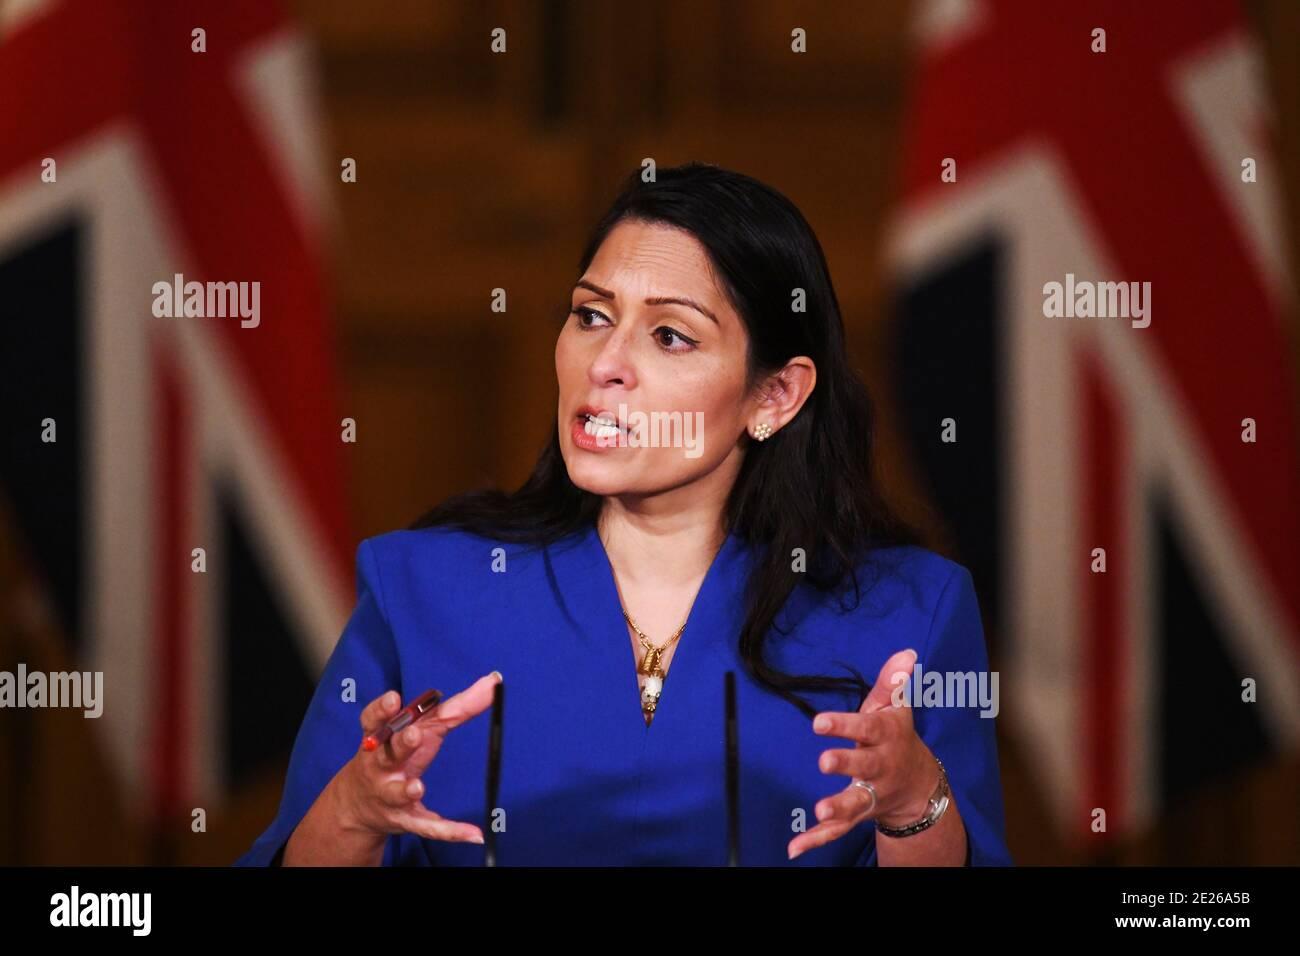 Britain's Home Secretary Priti Patel speaks at a coronavirus disease (COVID-19) related news conference at Downing Street, in London, Britain, January 12, 2021. Leon Neal/Pool via REUTERS Stock Photo